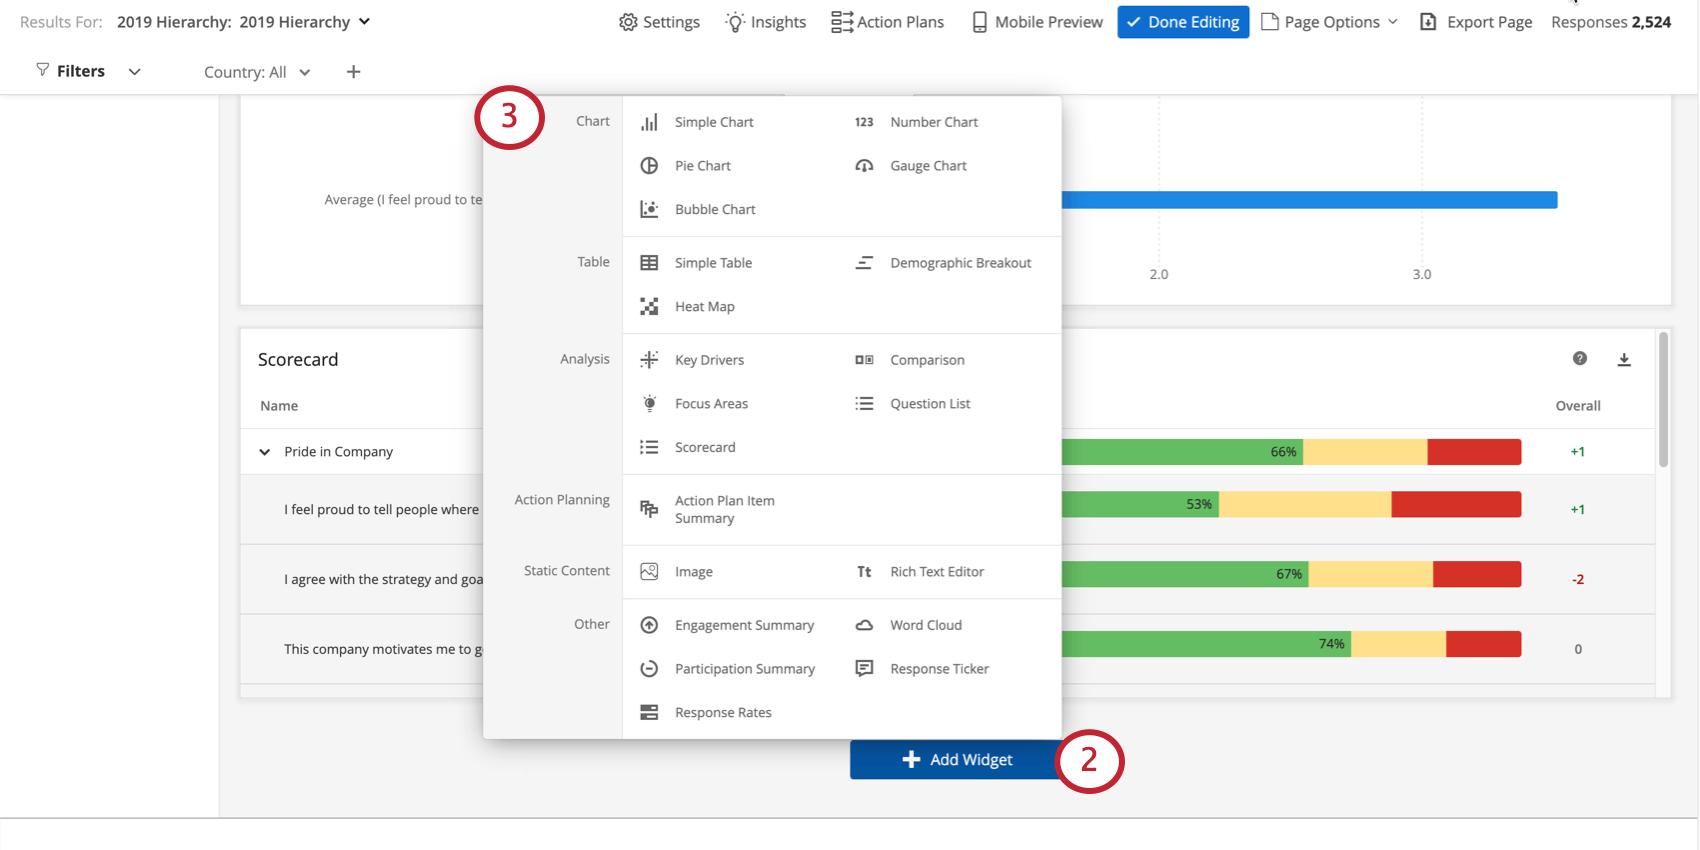 Add Widget button opening a menu of widget types